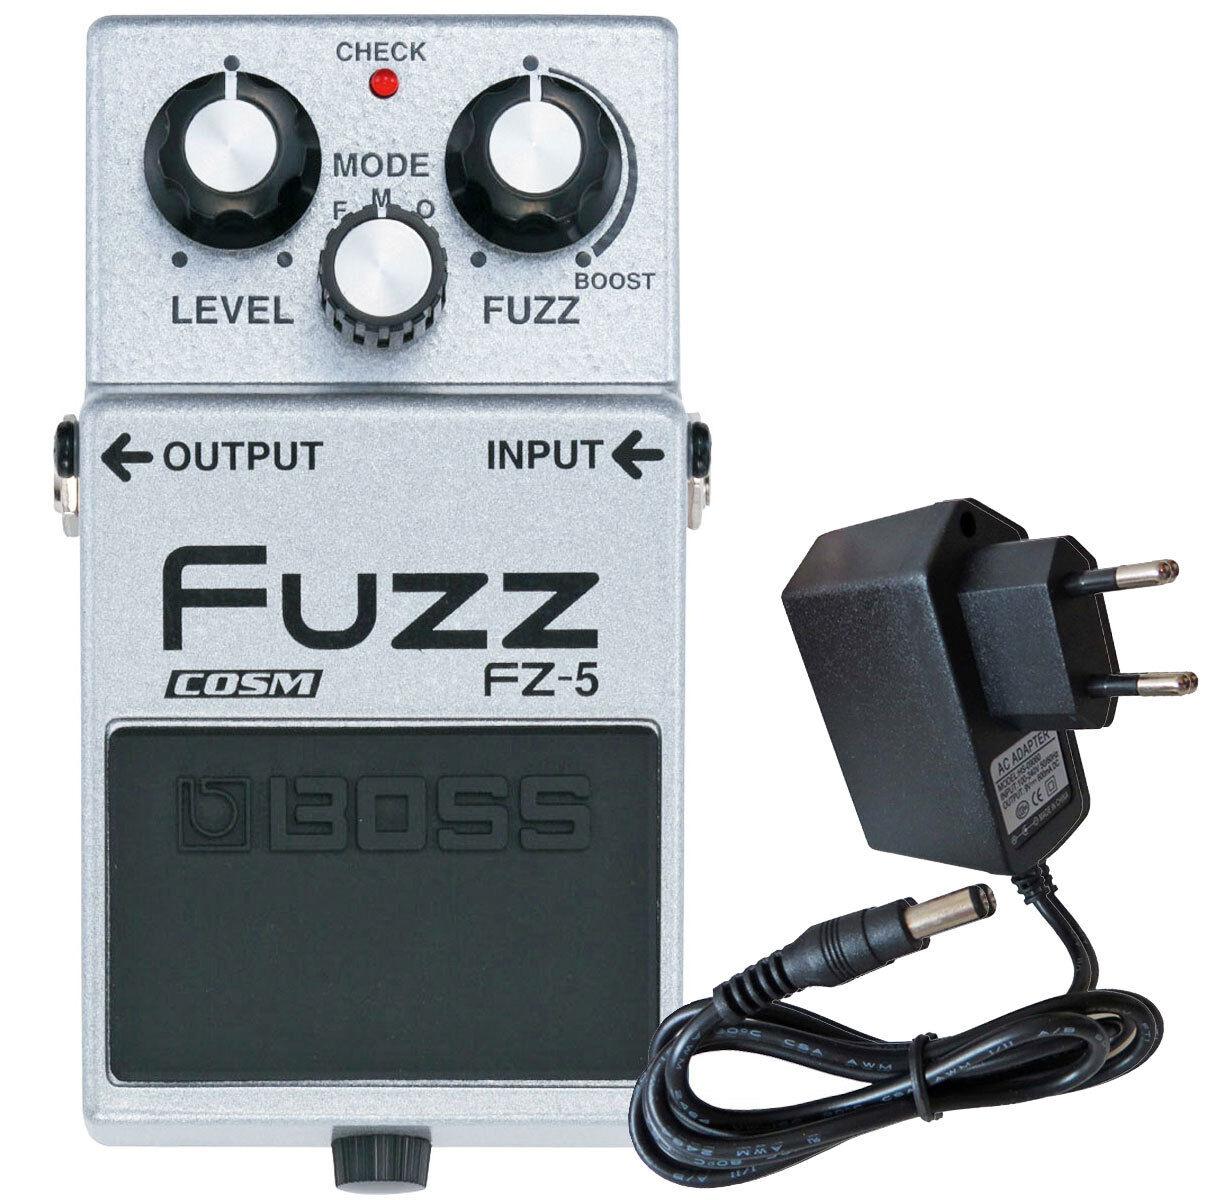 boss fz 5 fuzz pedal effects unit keepdrum supply 9v 761294403563 ebay. Black Bedroom Furniture Sets. Home Design Ideas